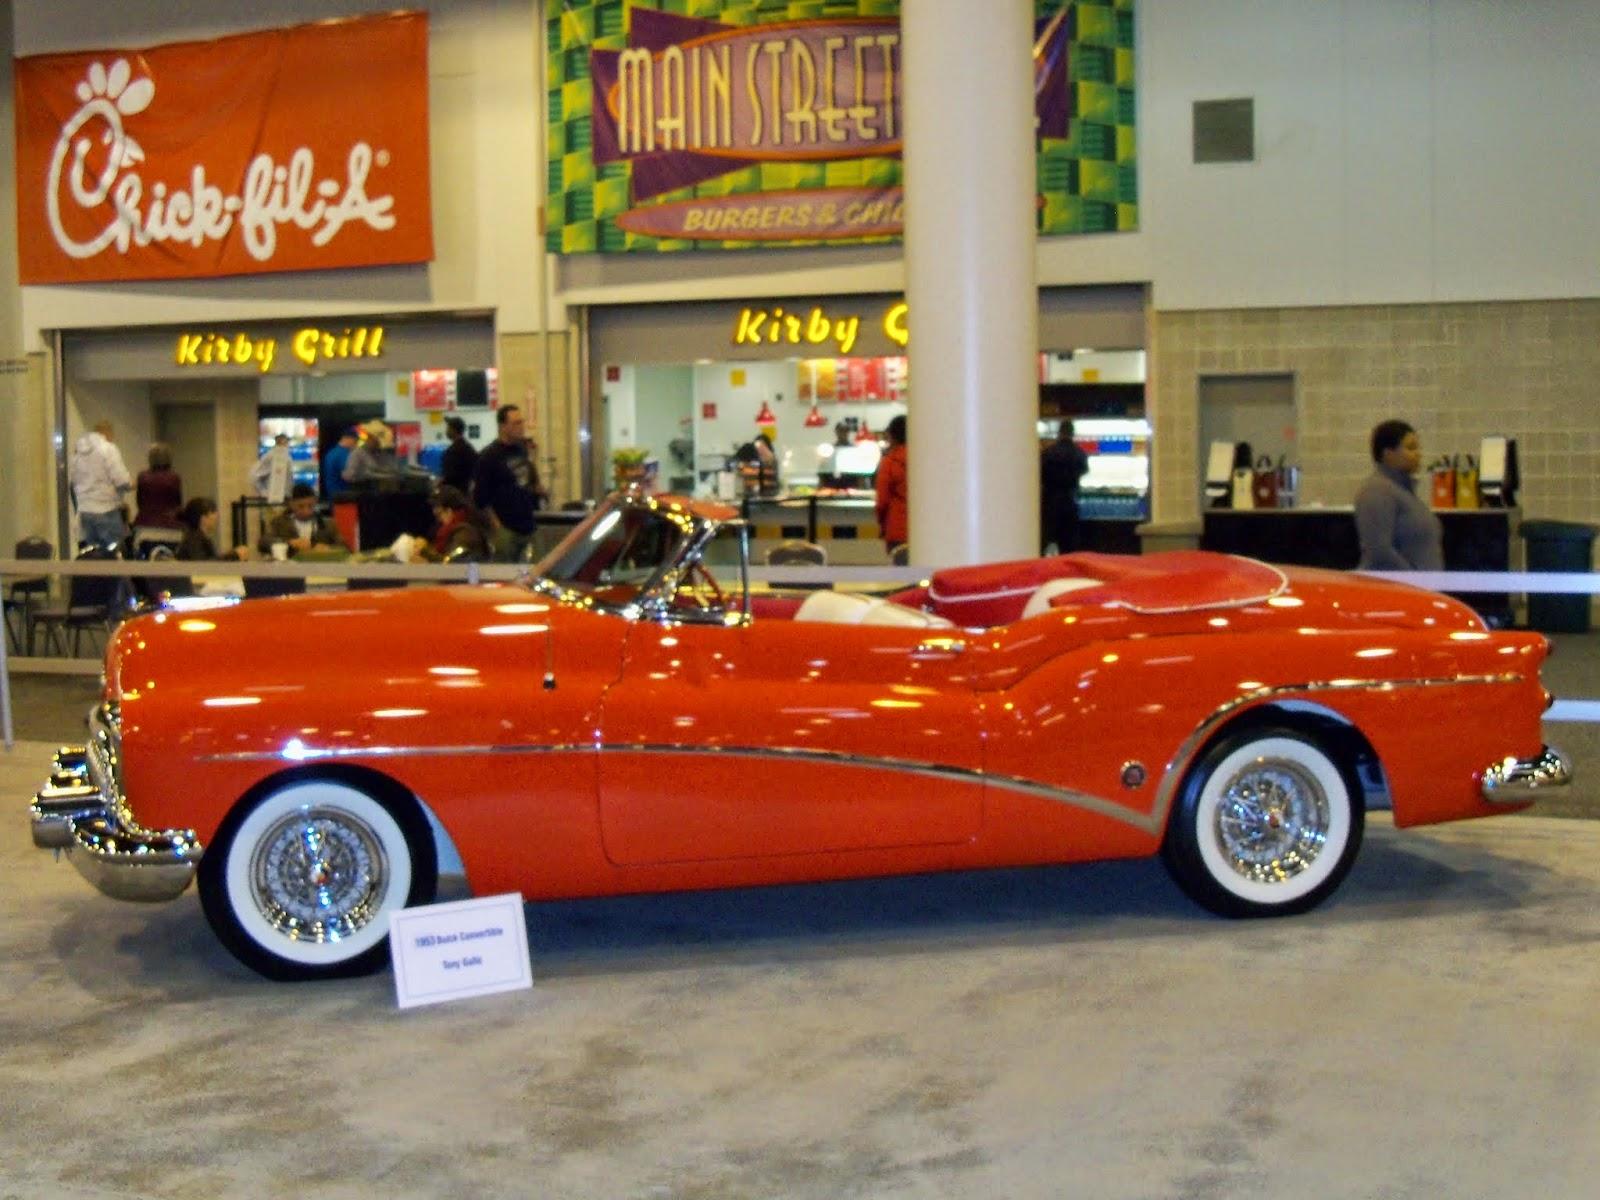 Houston Auto Show 2015 - 116_7249.JPG